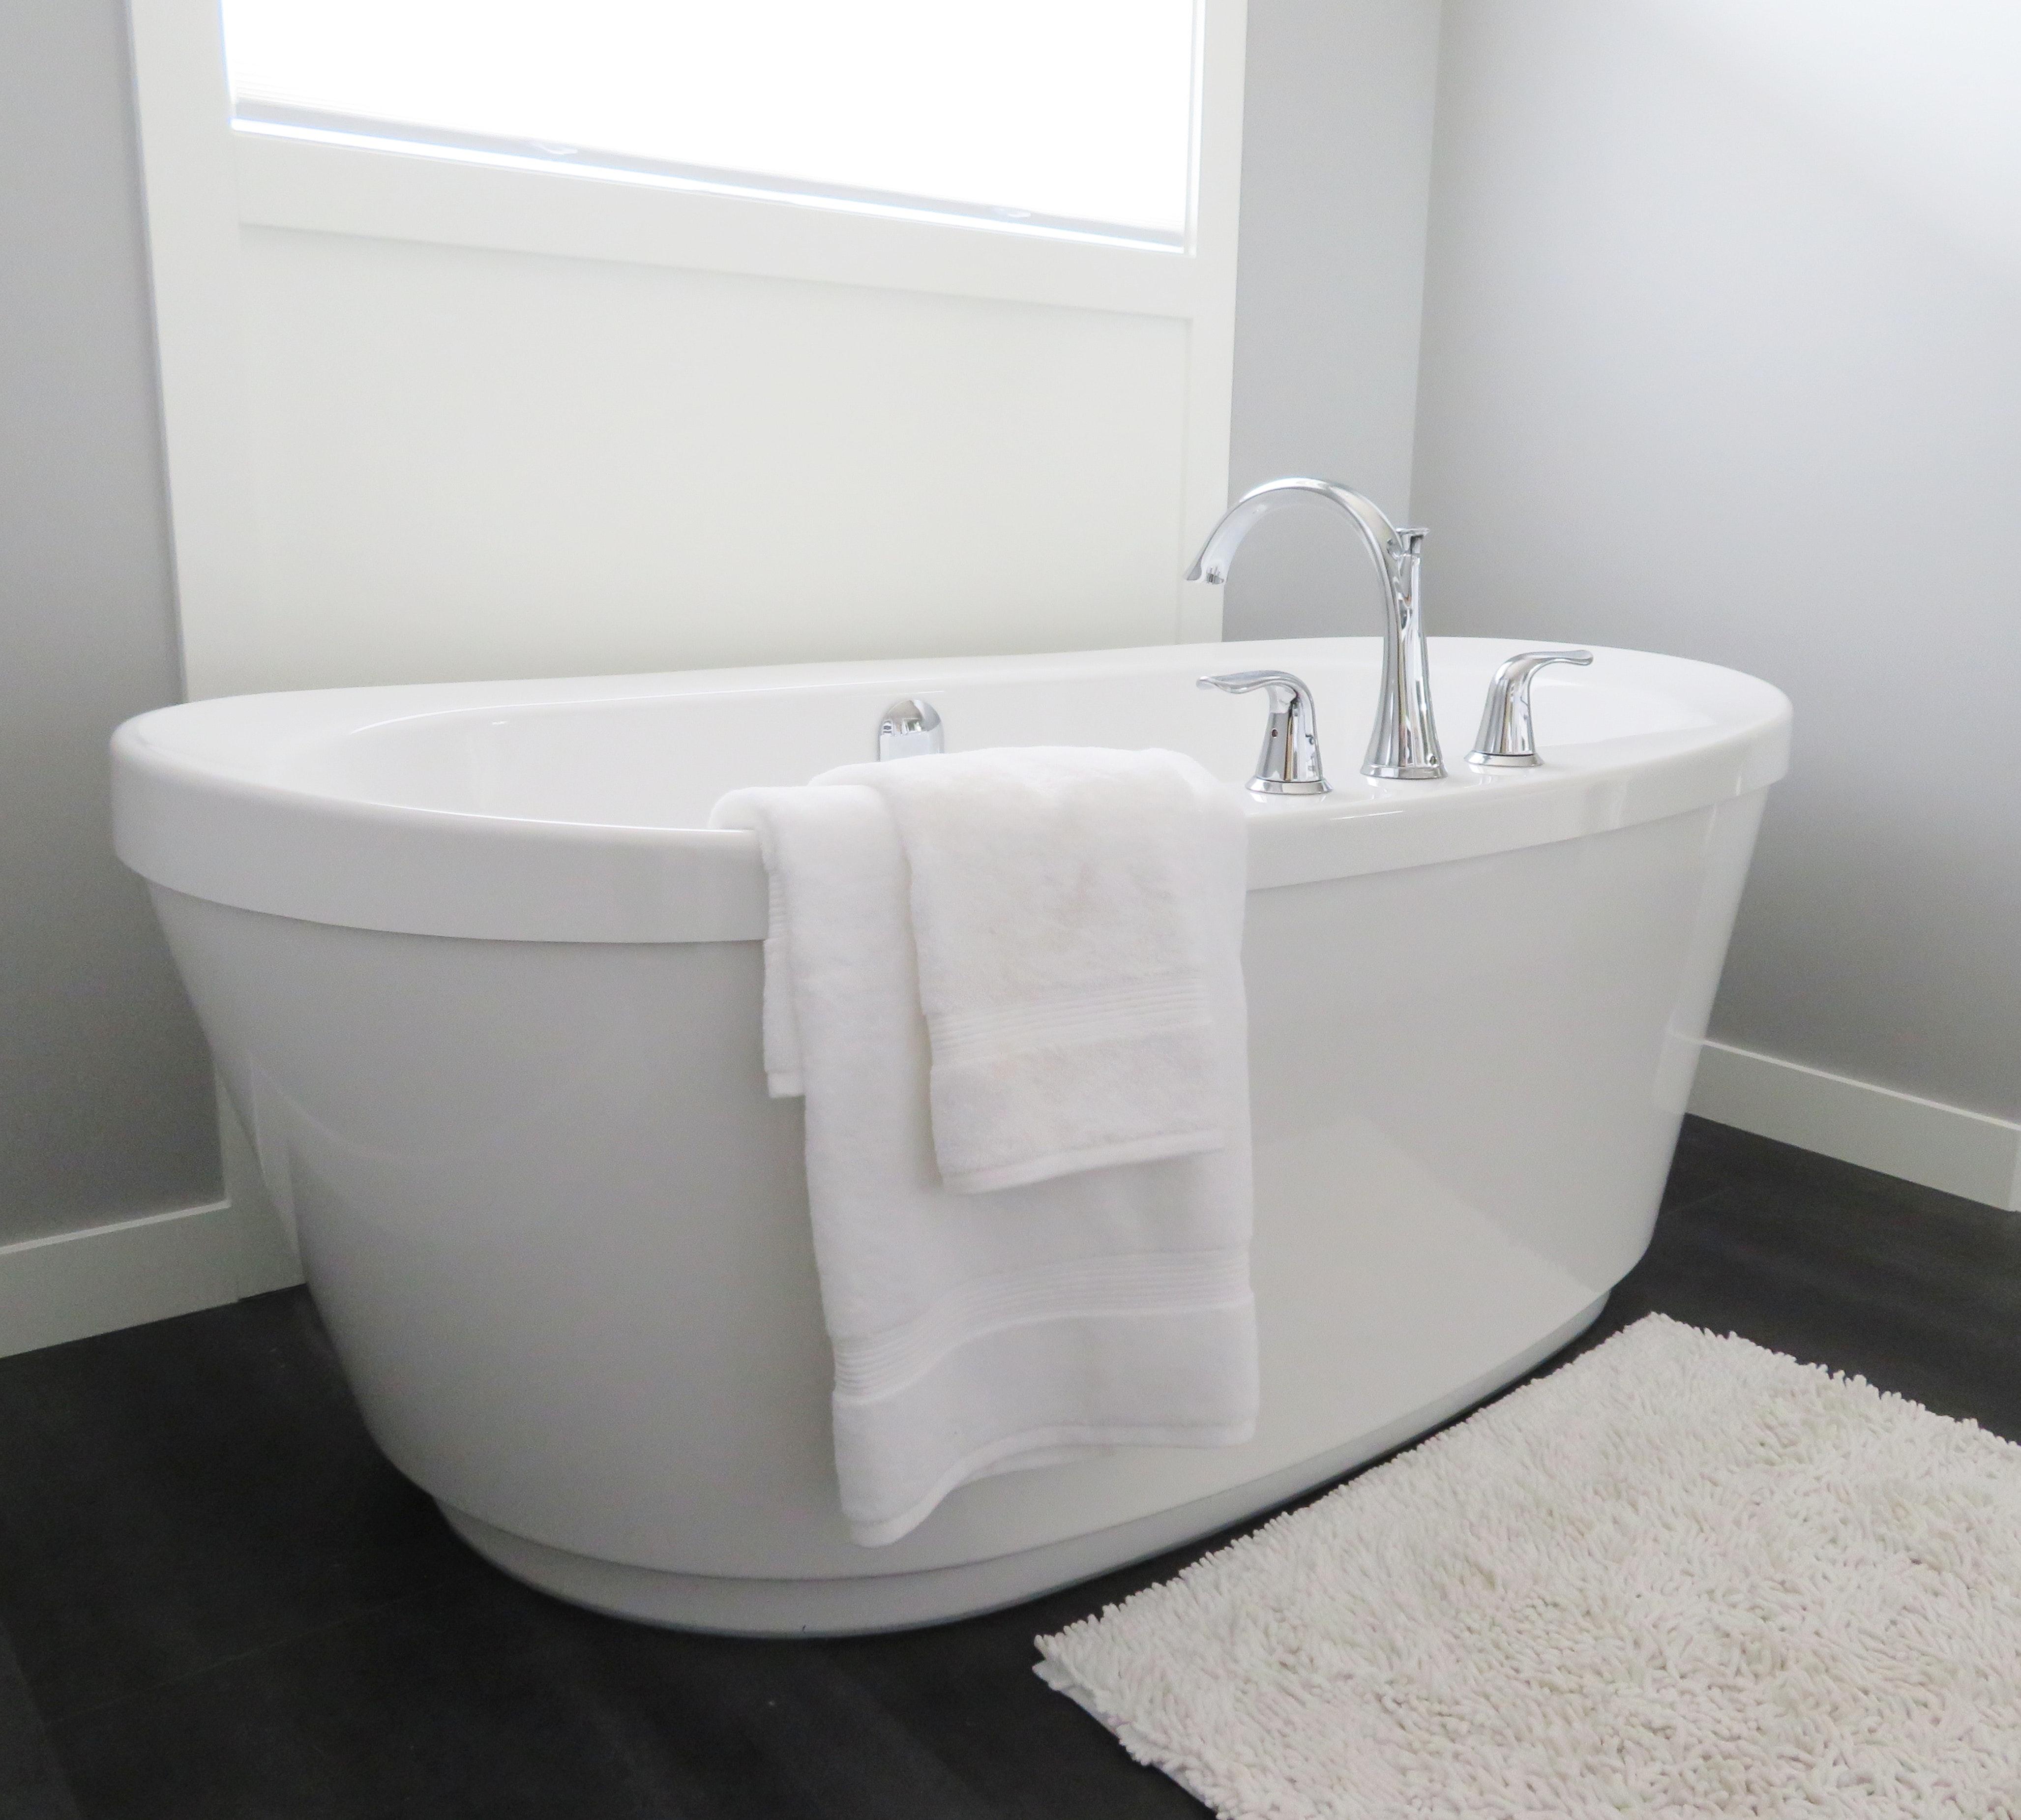 50+ Great Bathroom Photos · Pexels · Free Stock Photos